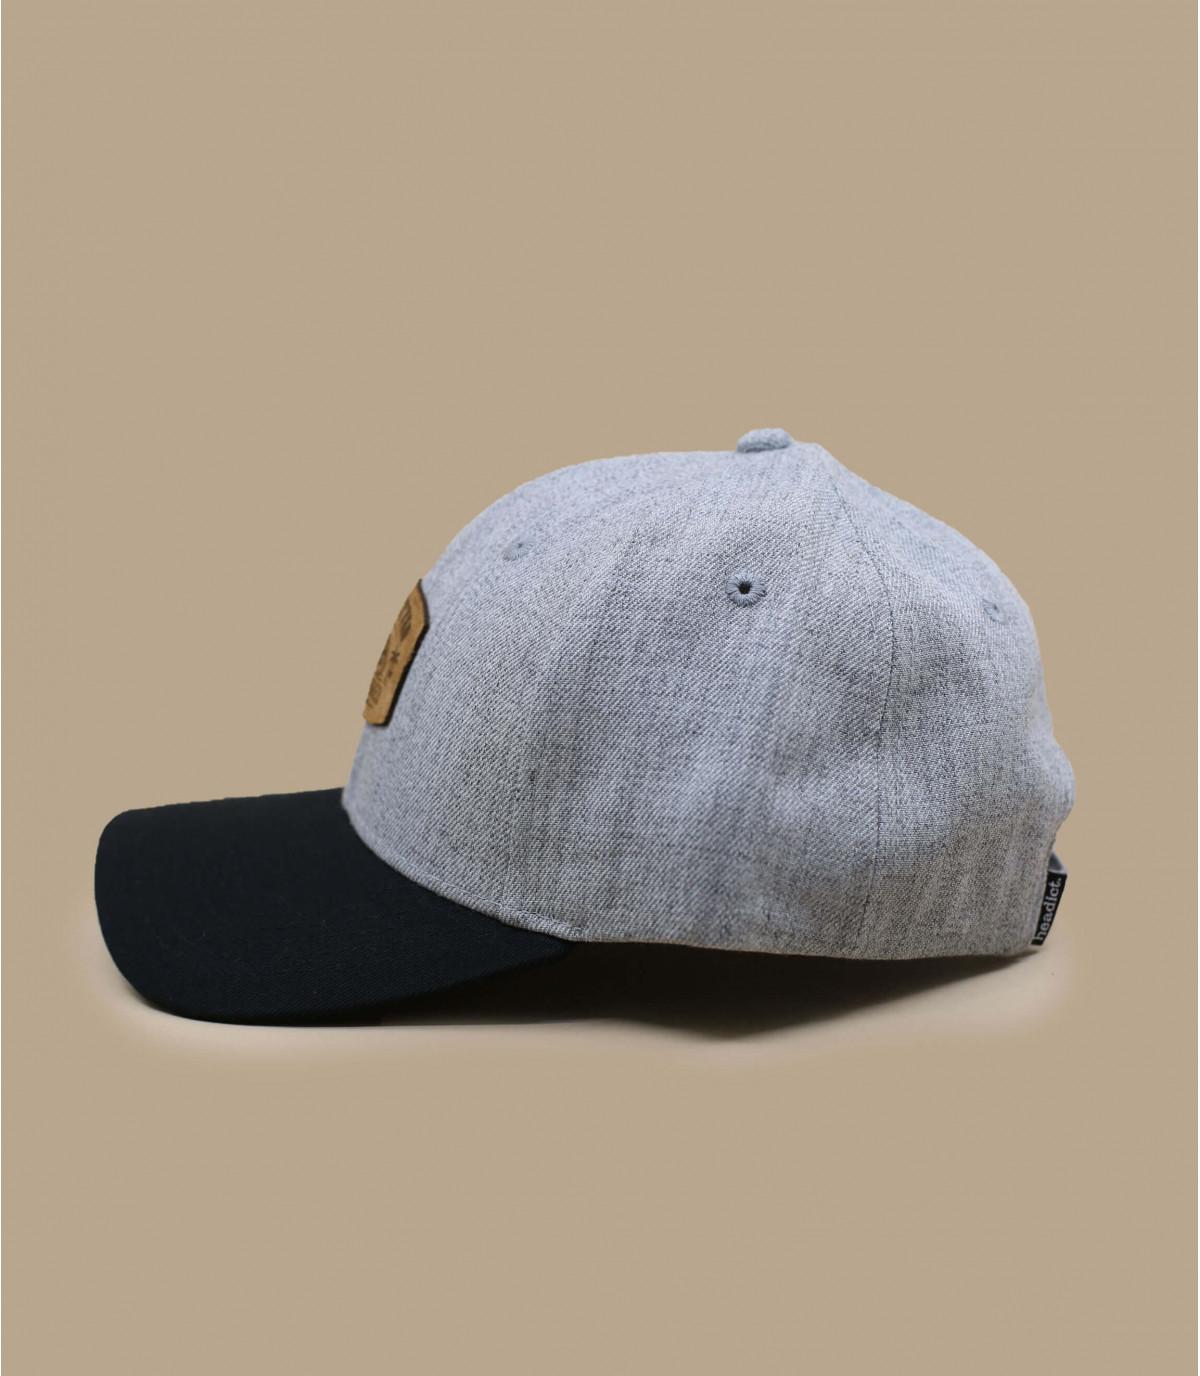 grey and black tandem cap